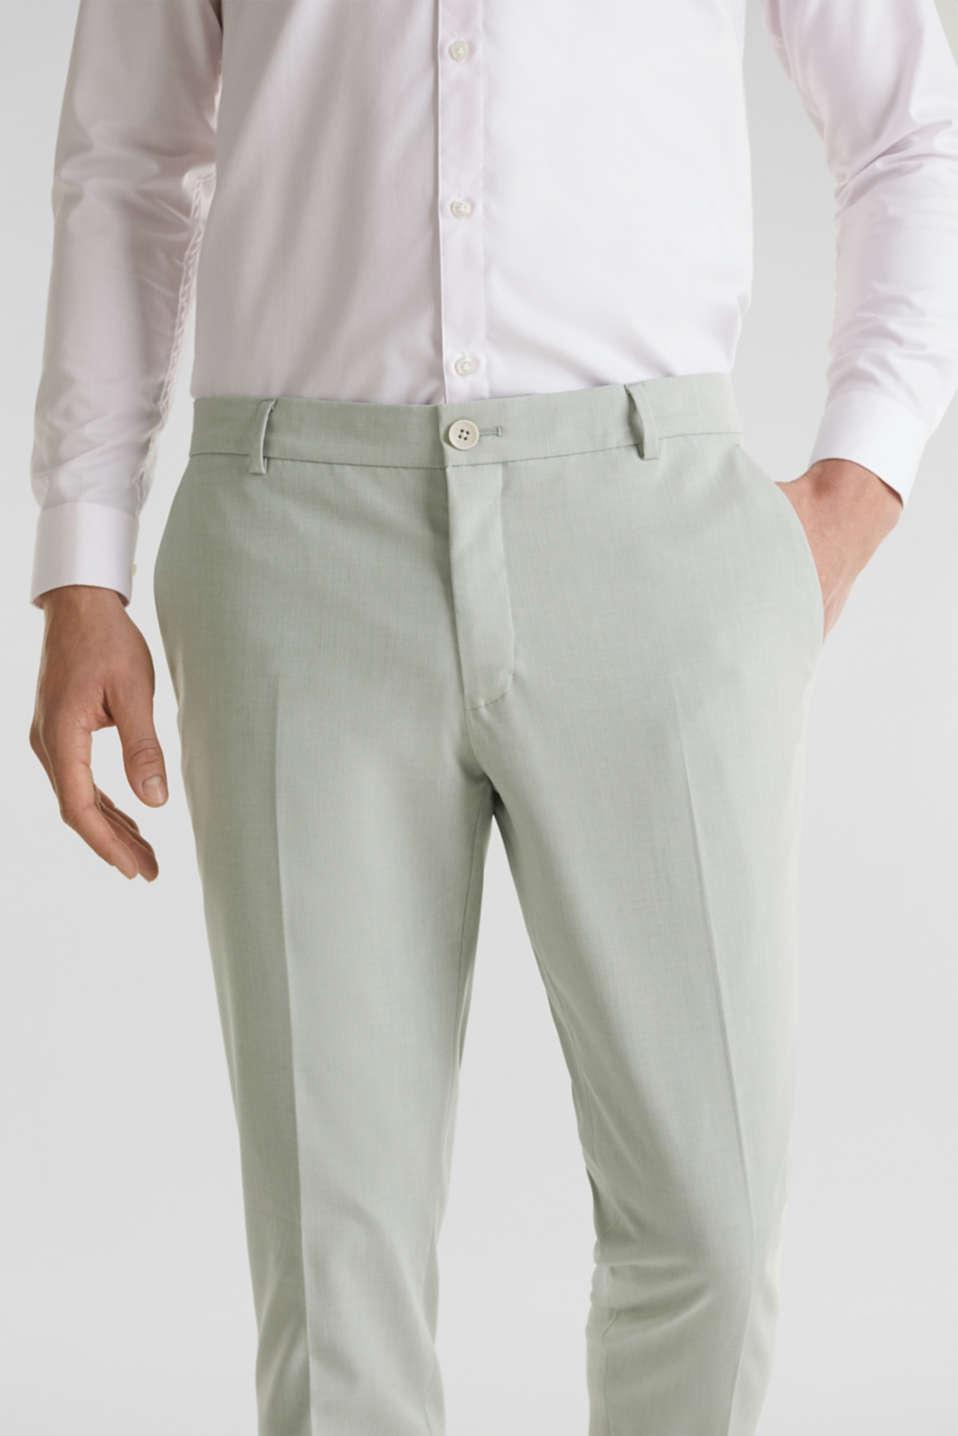 FINE MELANGE mix + match trousers, PASTEL GREEN 5, detail image number 3